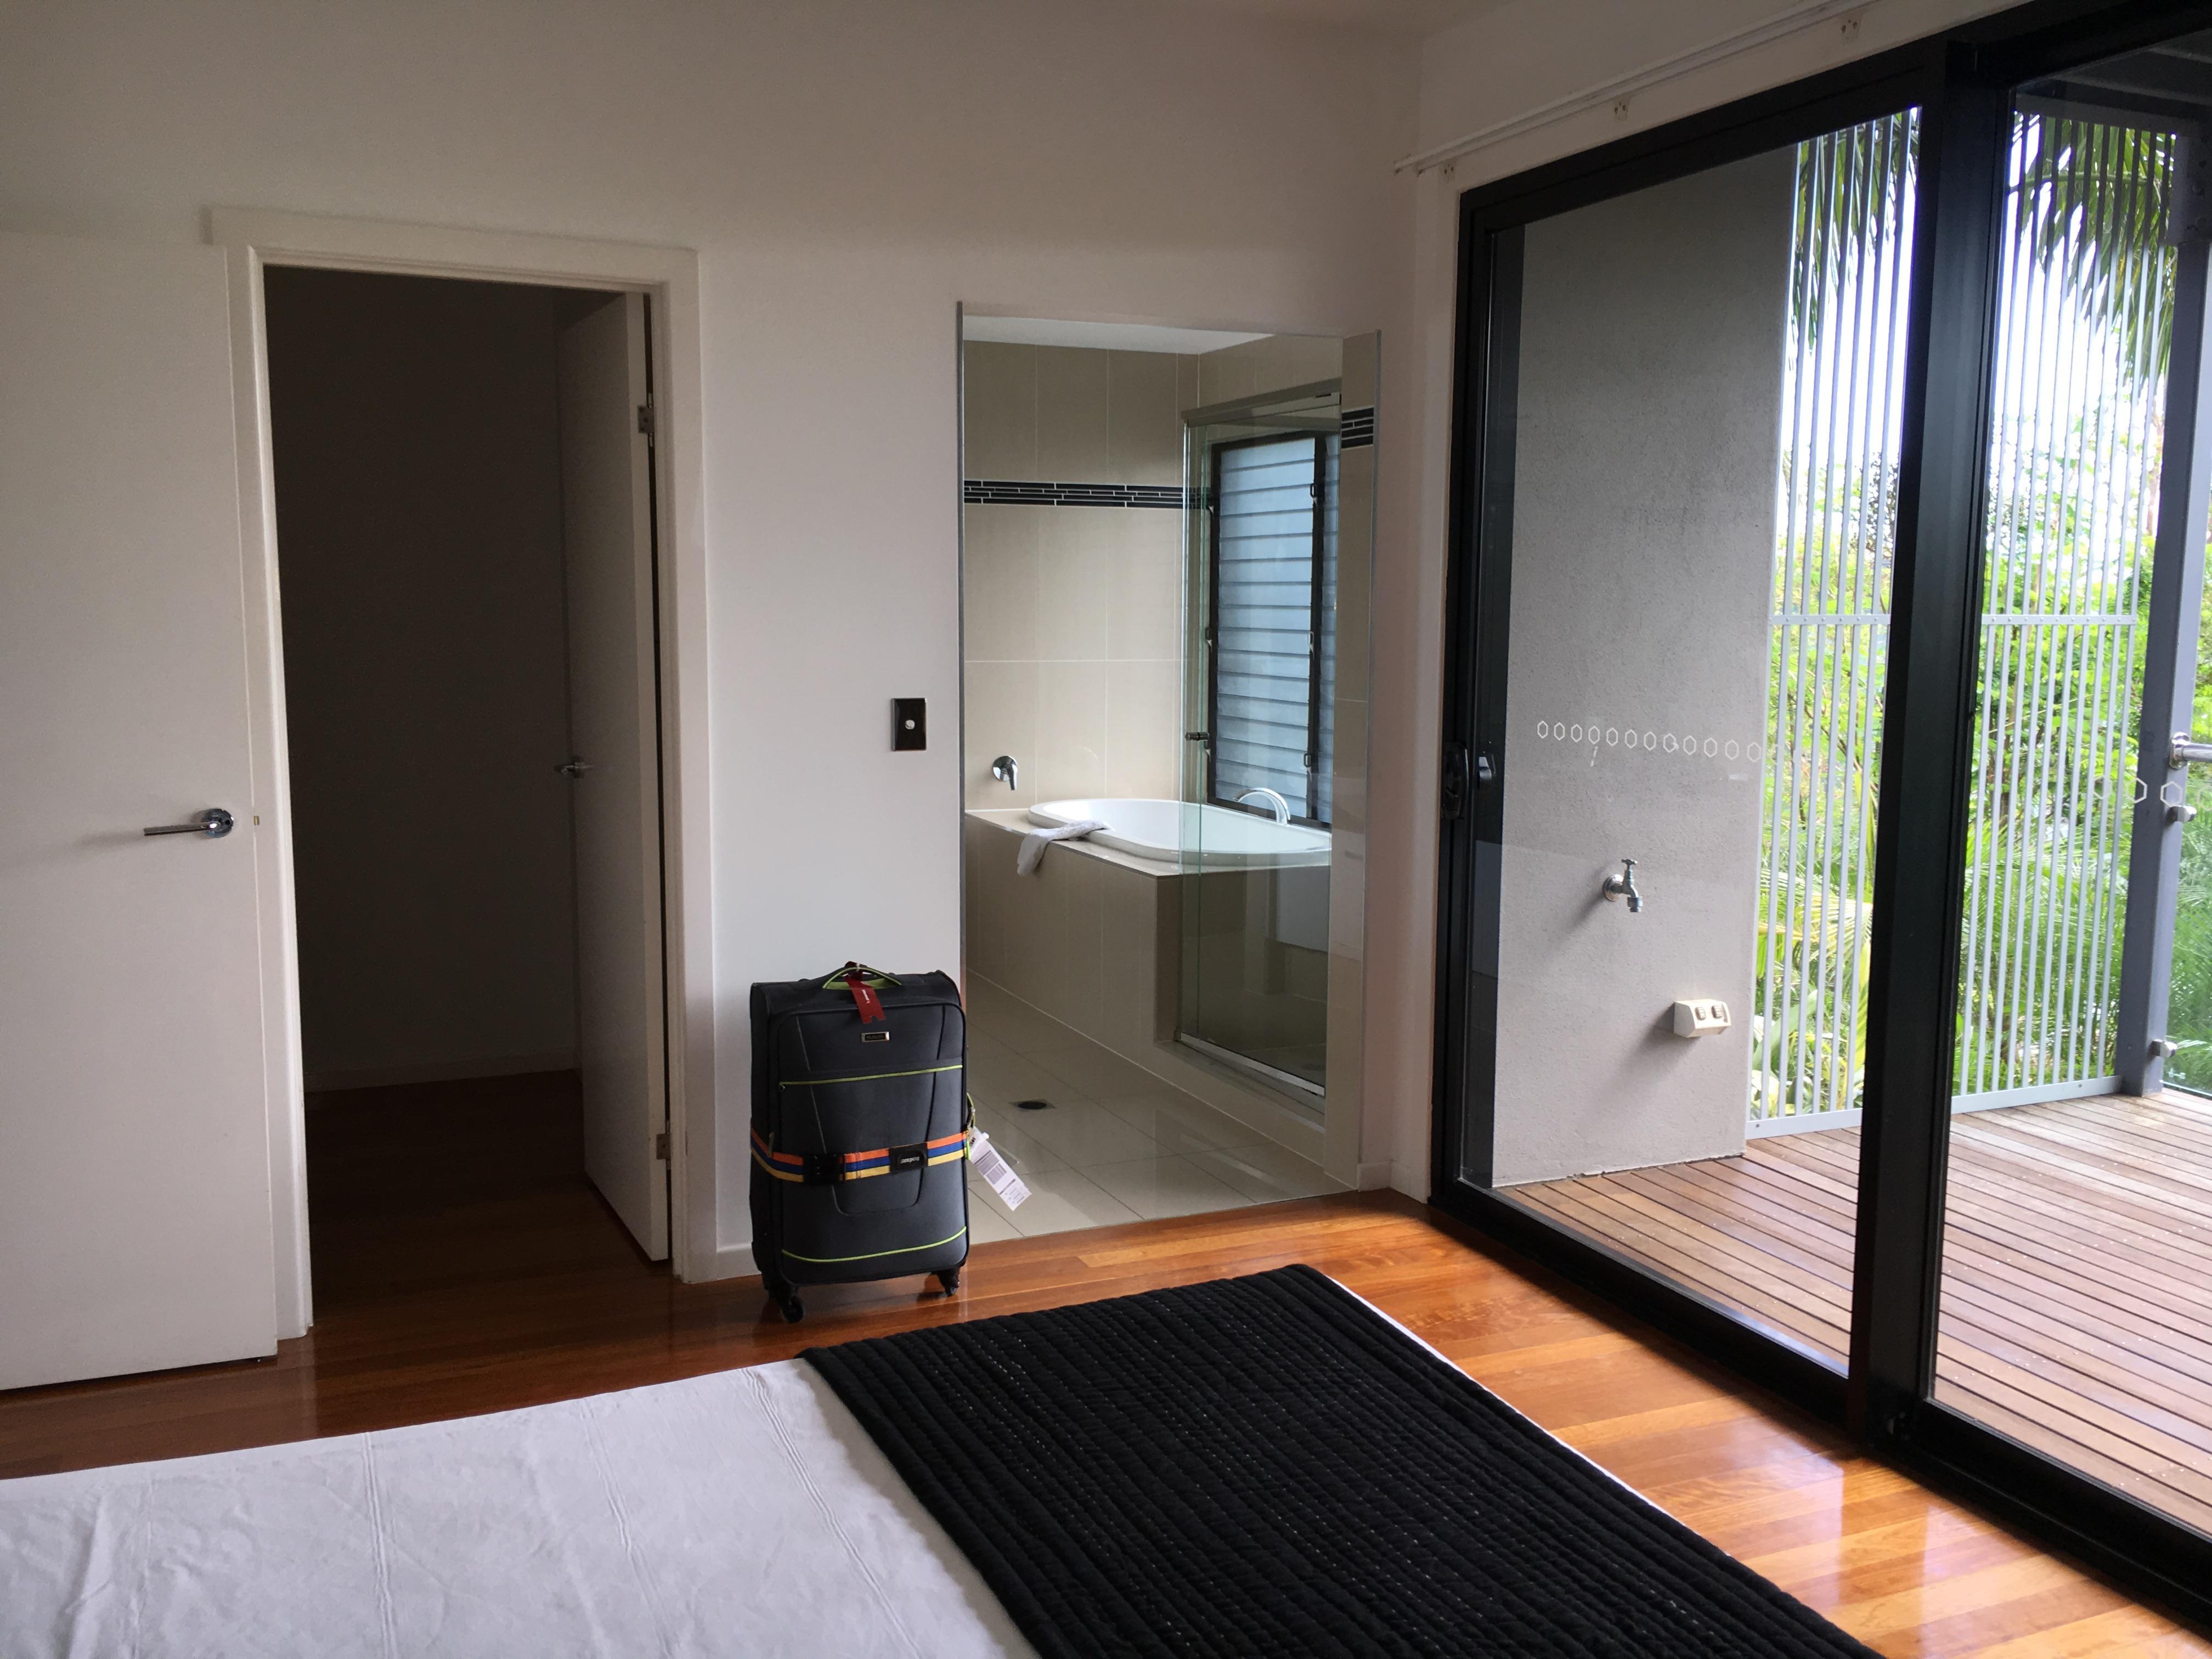 Downstairs Main bedroom and Balcony